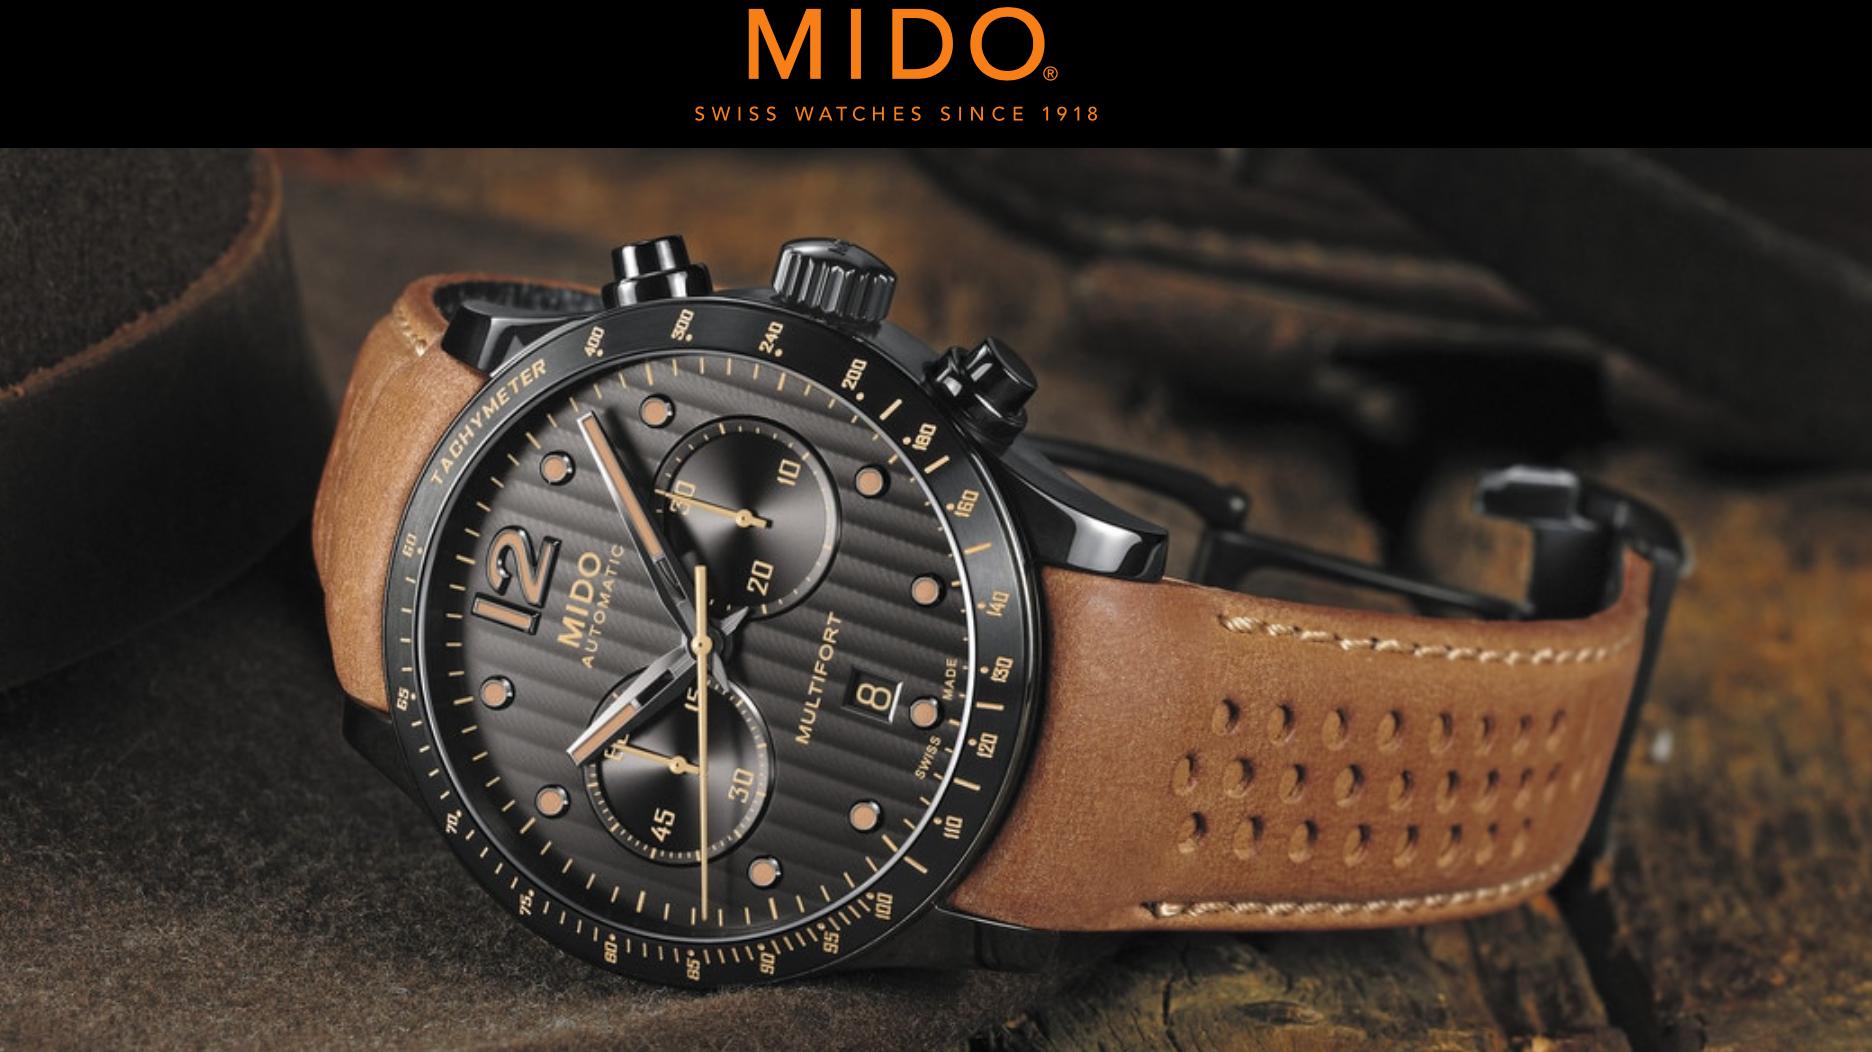 Mido - Made in Switzerland